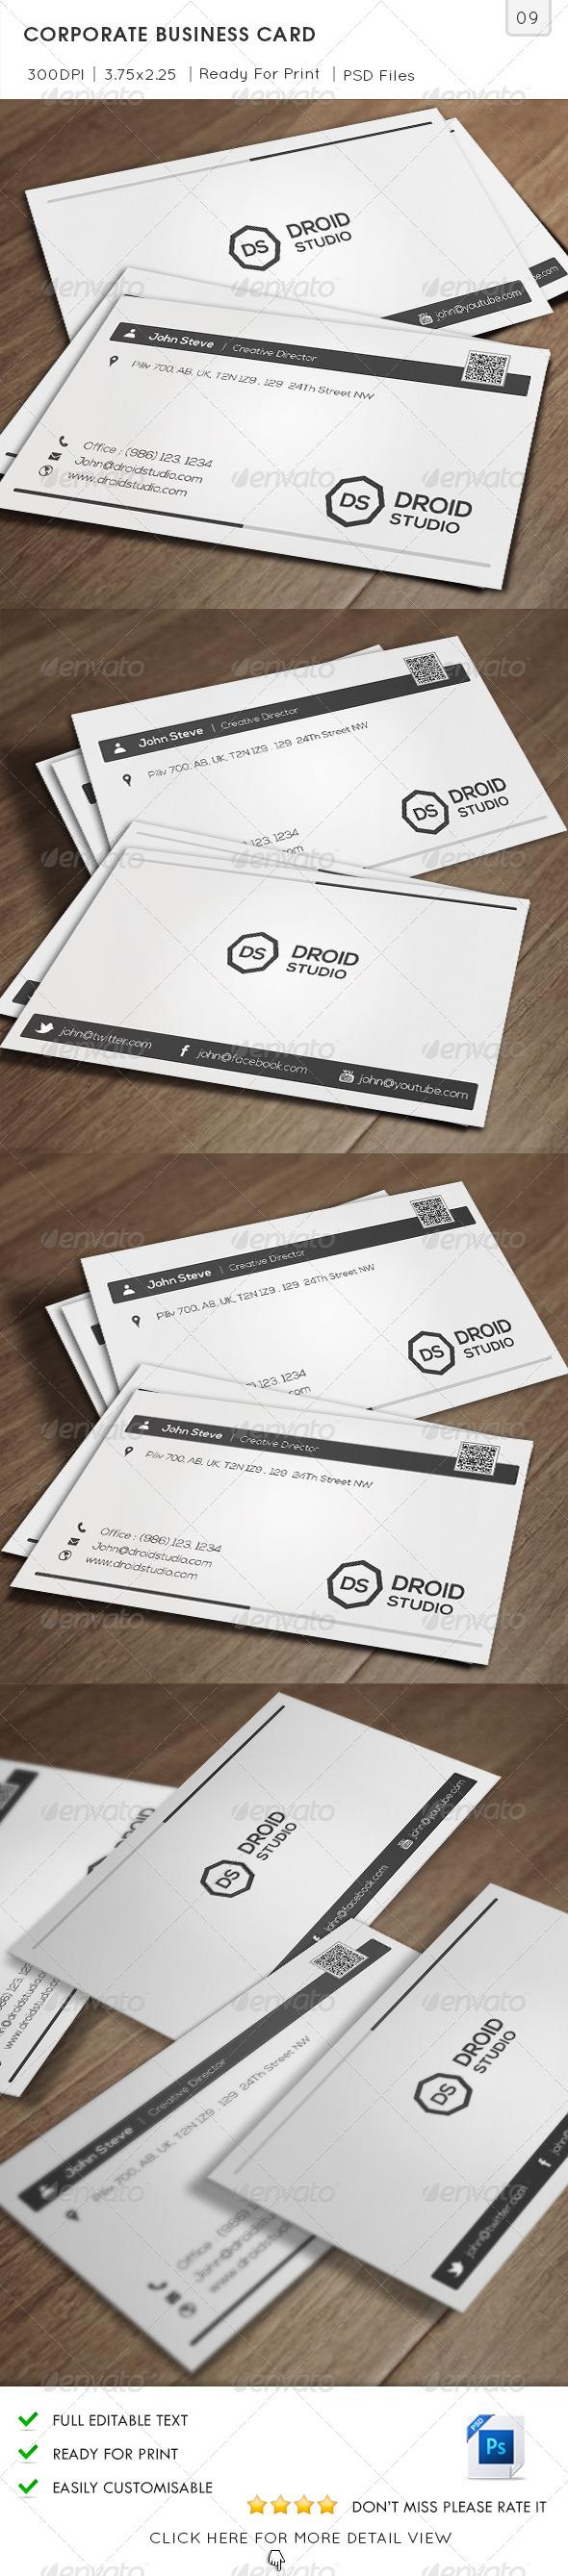 Corporate Business Card v09 - Corporate Business Cards